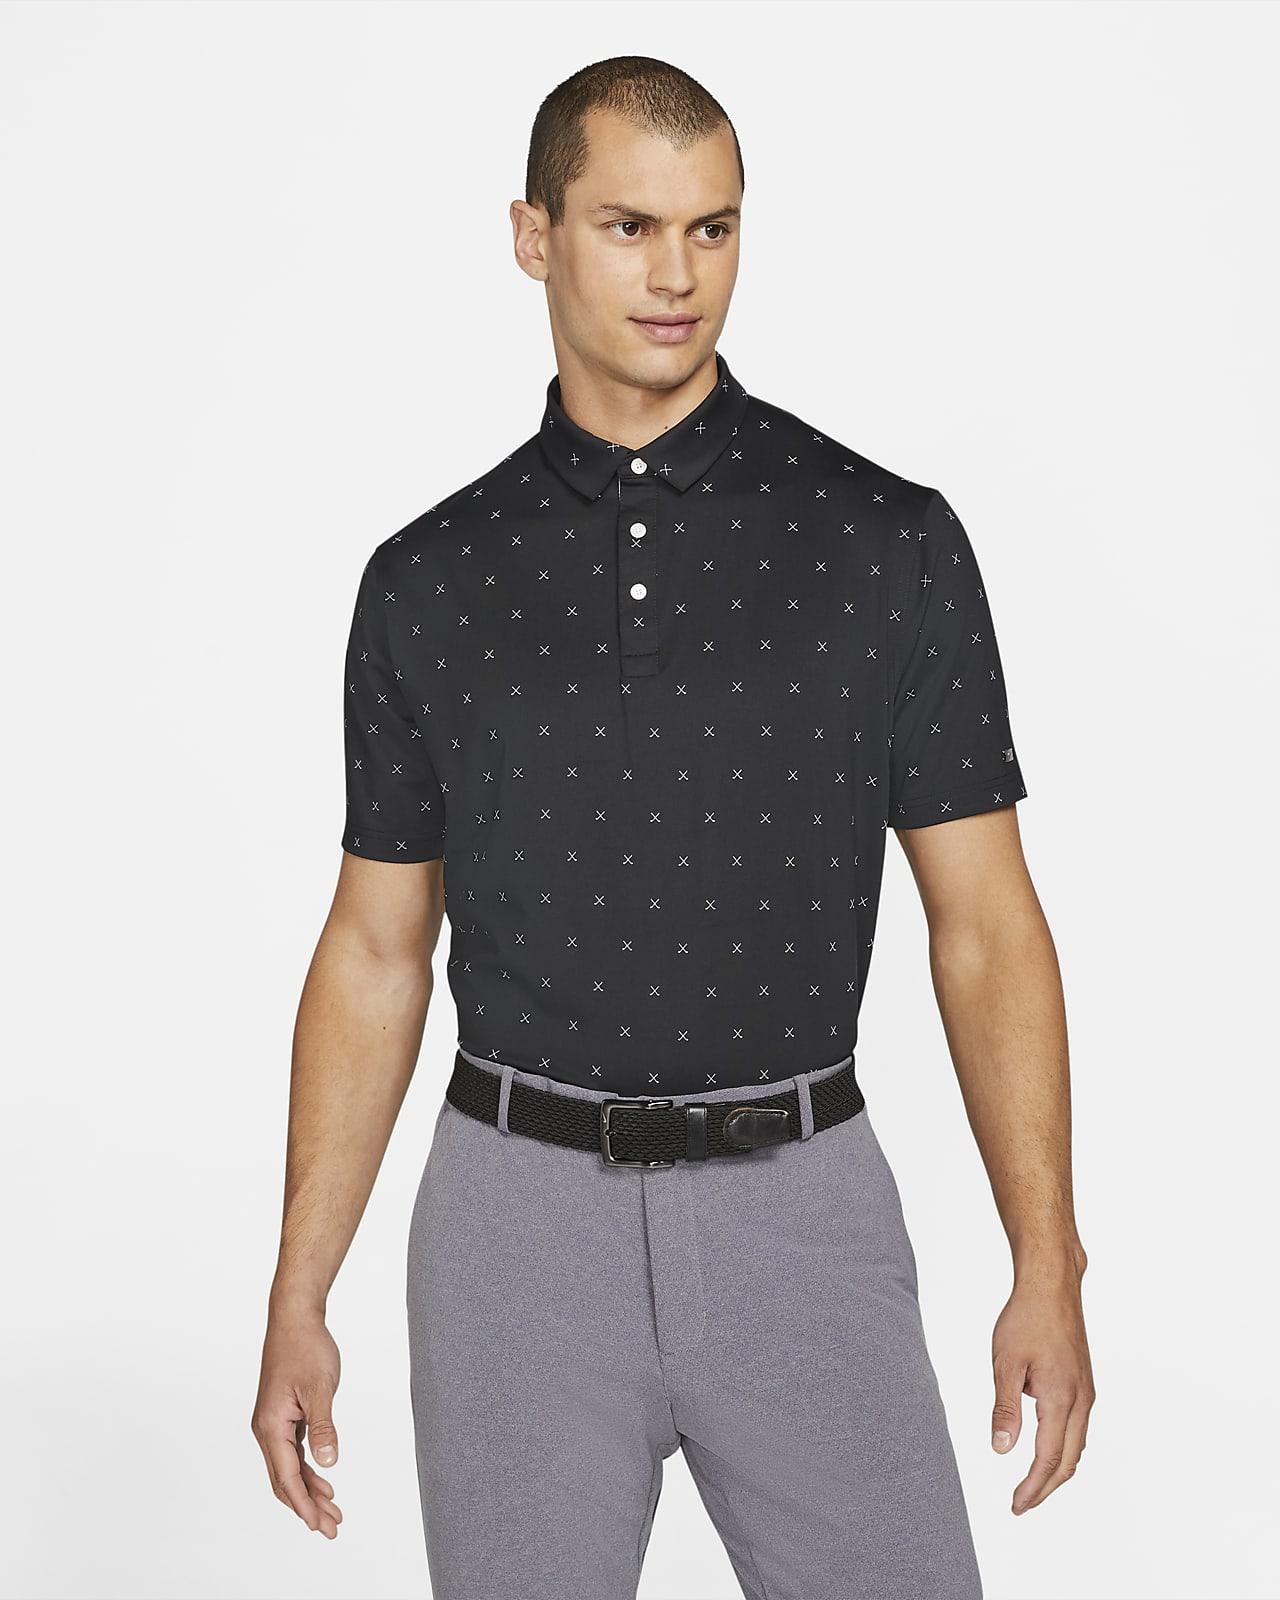 Nike Dri-FIT Player Men's Printed Golf Polo